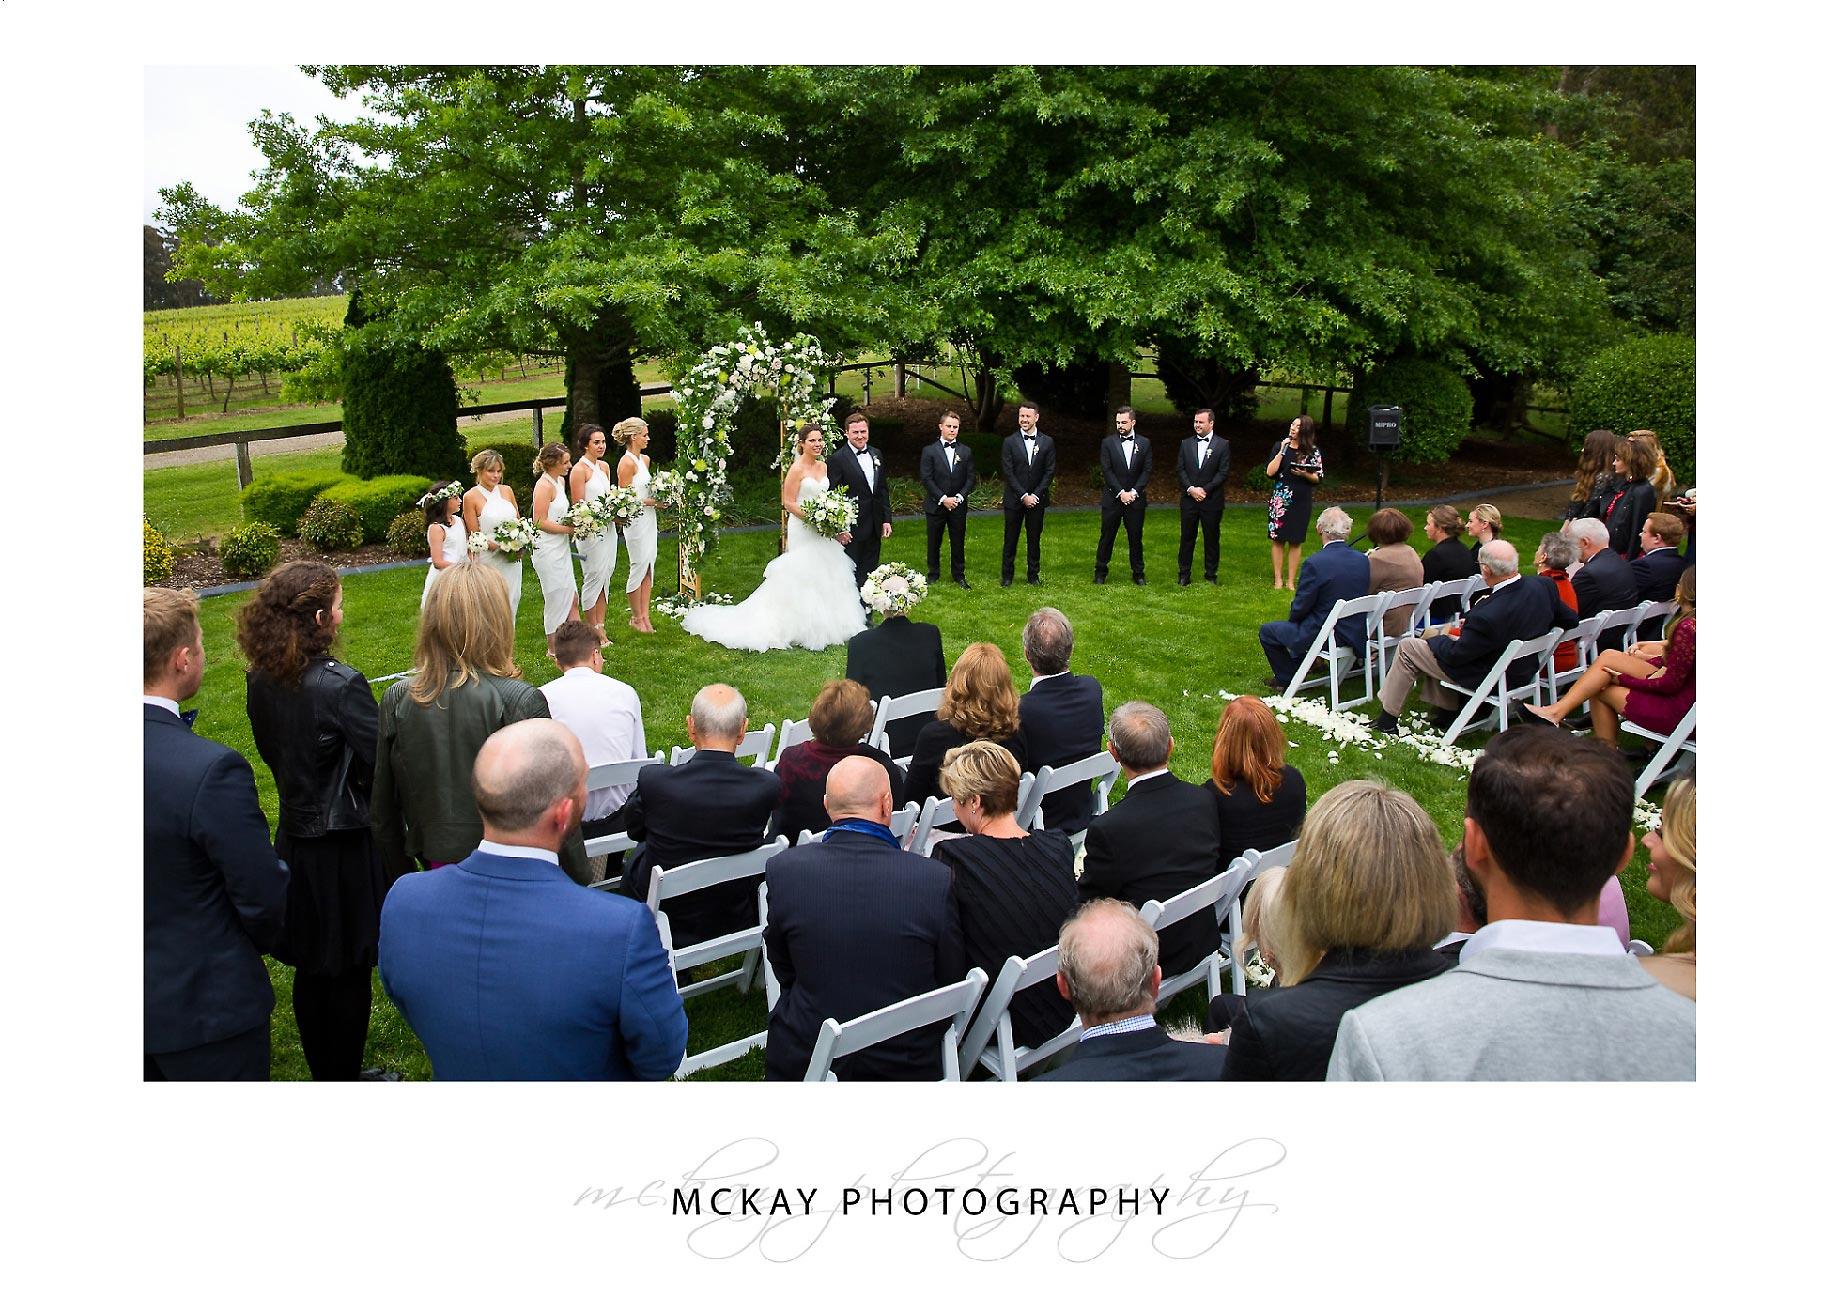 Centennial Vineyards Bowral wedding ceremony set up on lawn